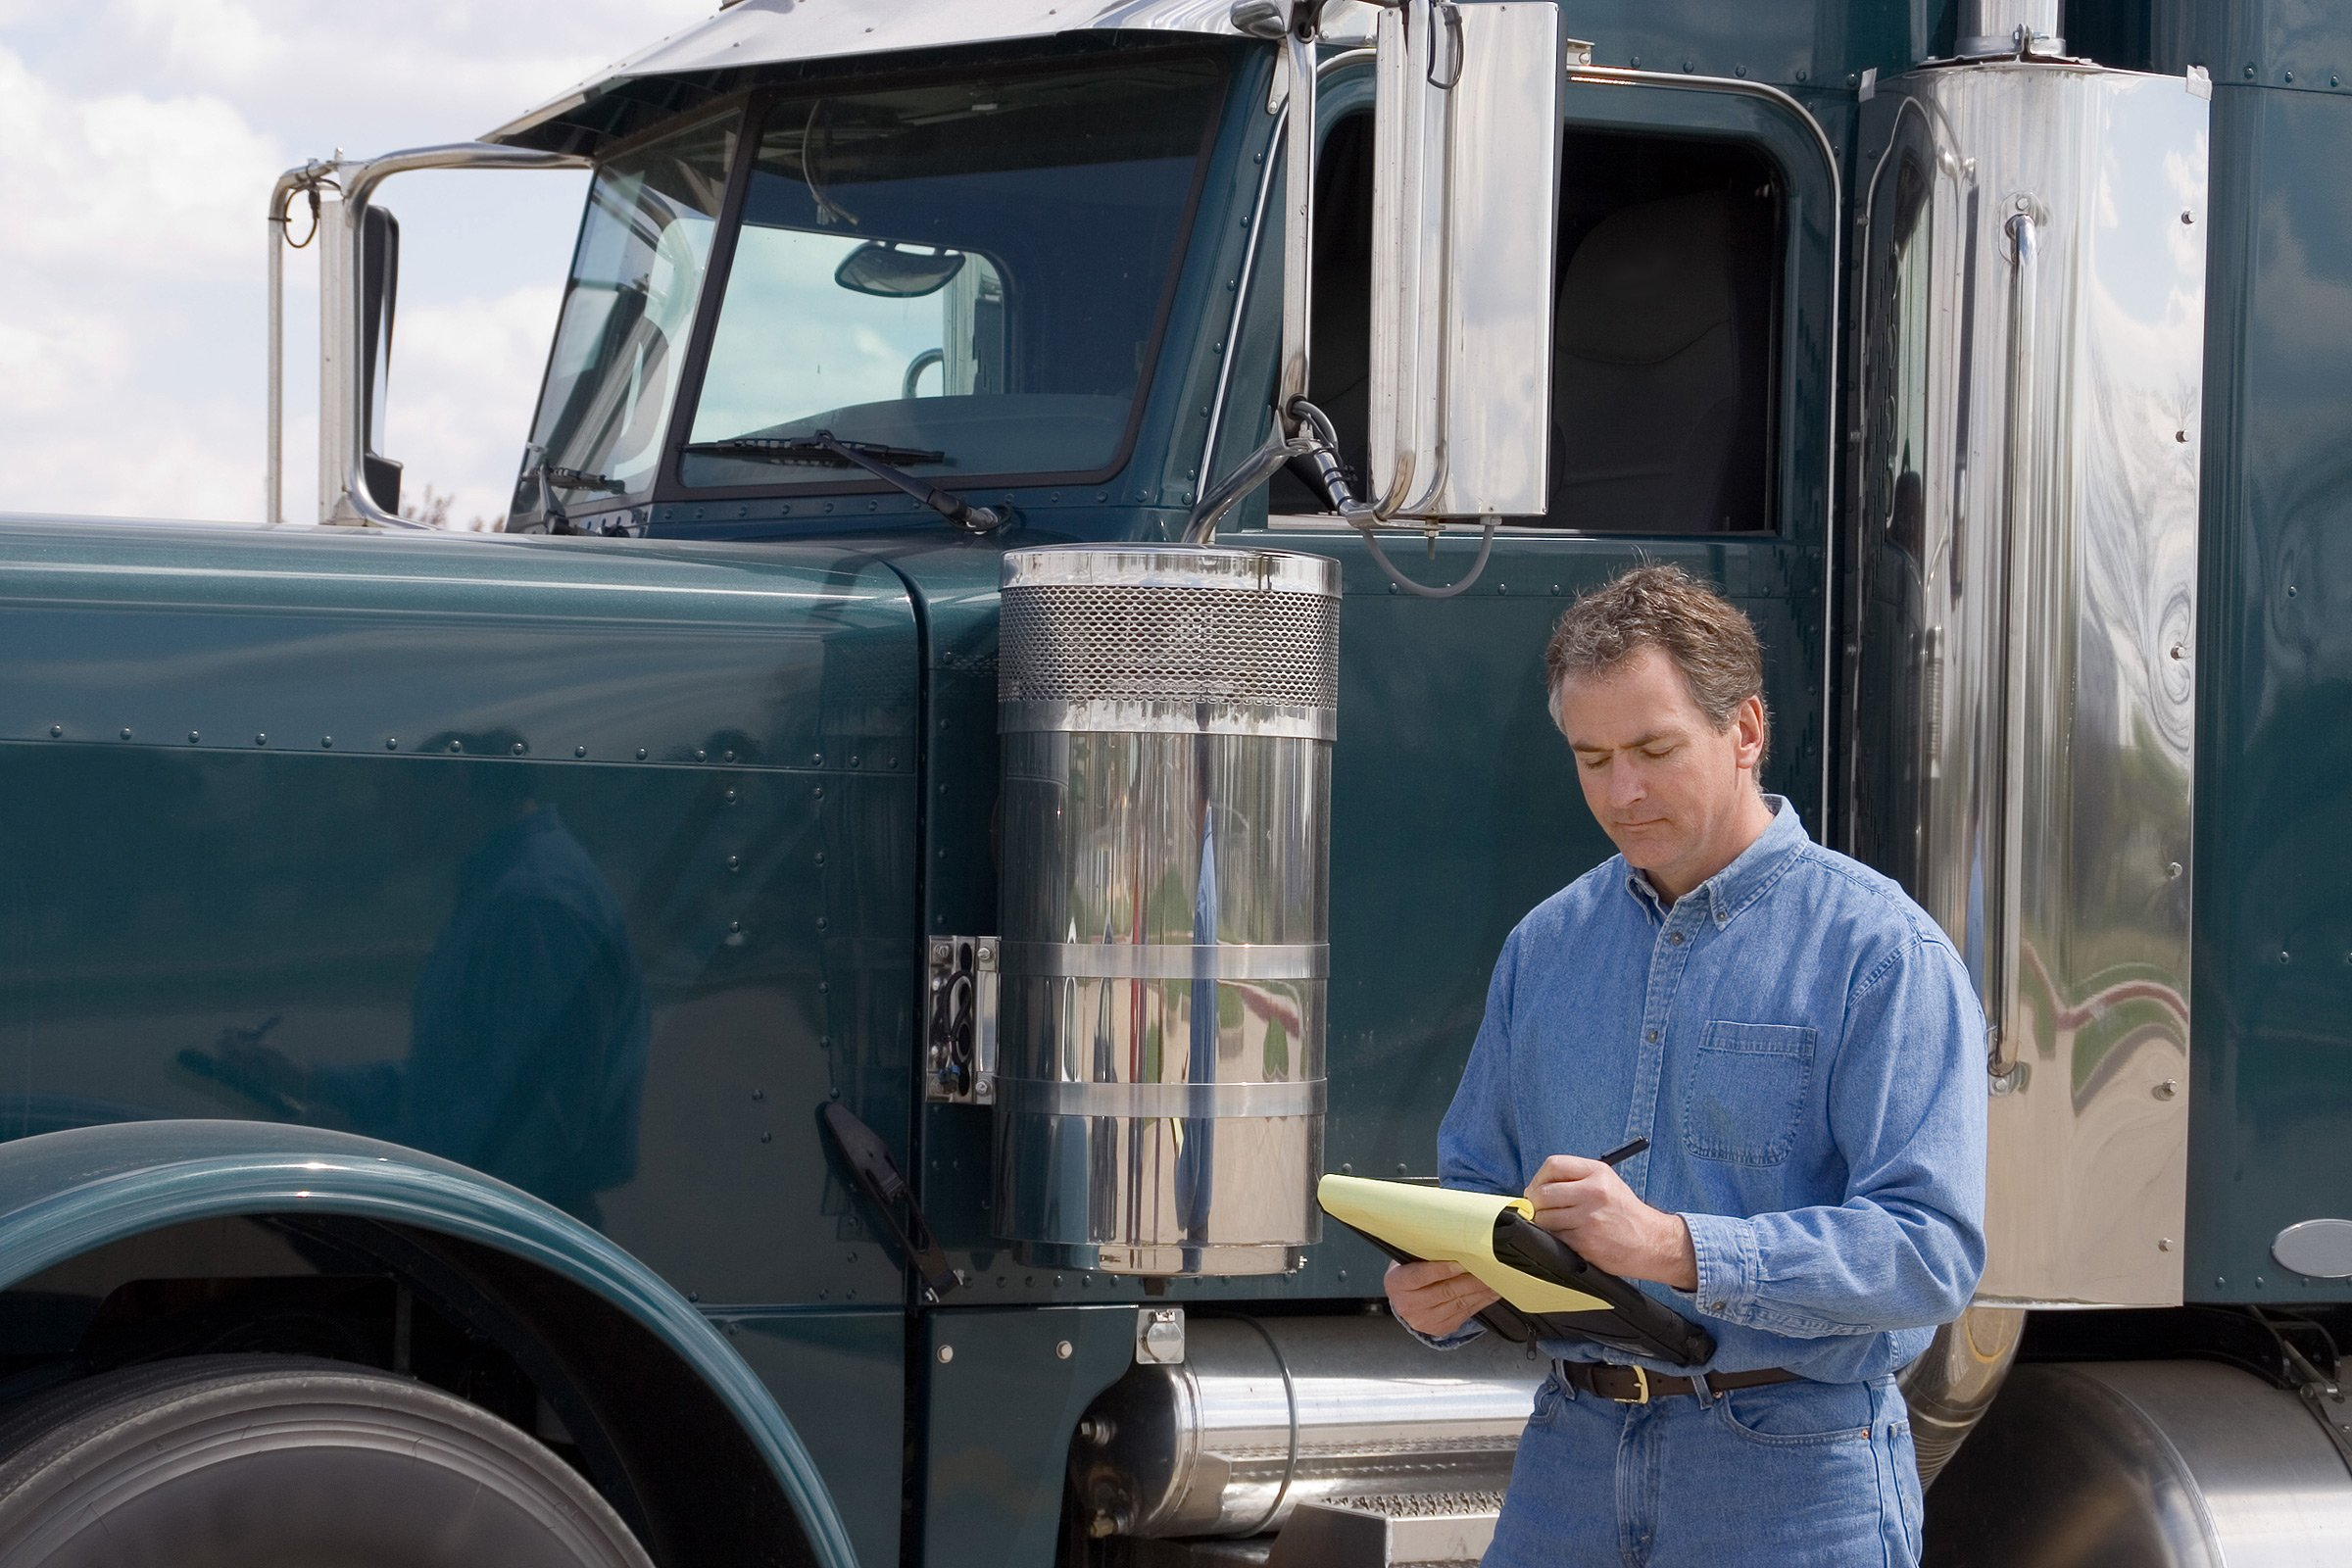 Truck Driver Writing on iPad